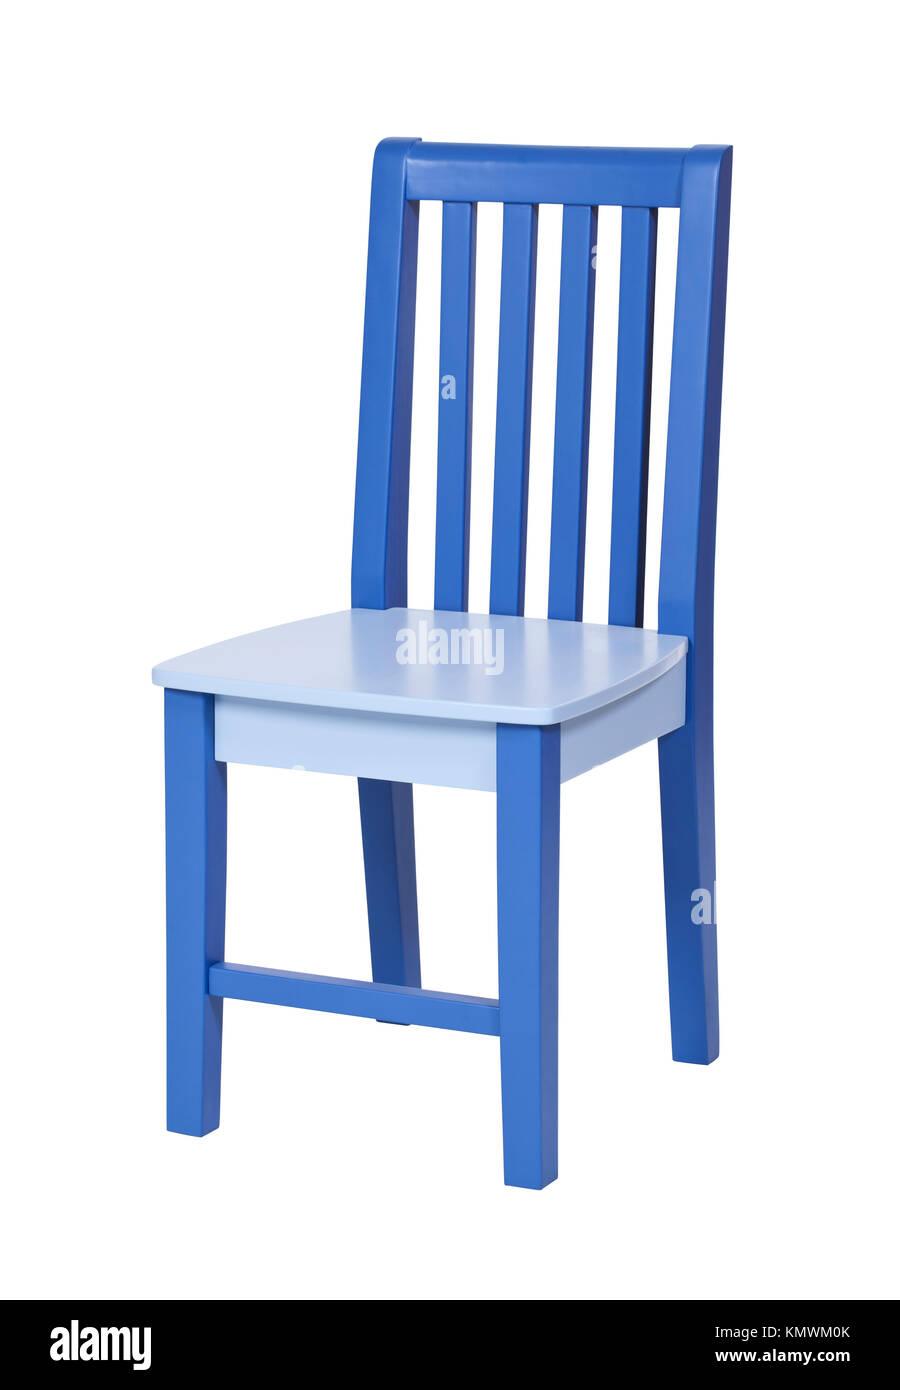 Wooden Chair Cutout Stock Photos Amp Wooden Chair Cutout